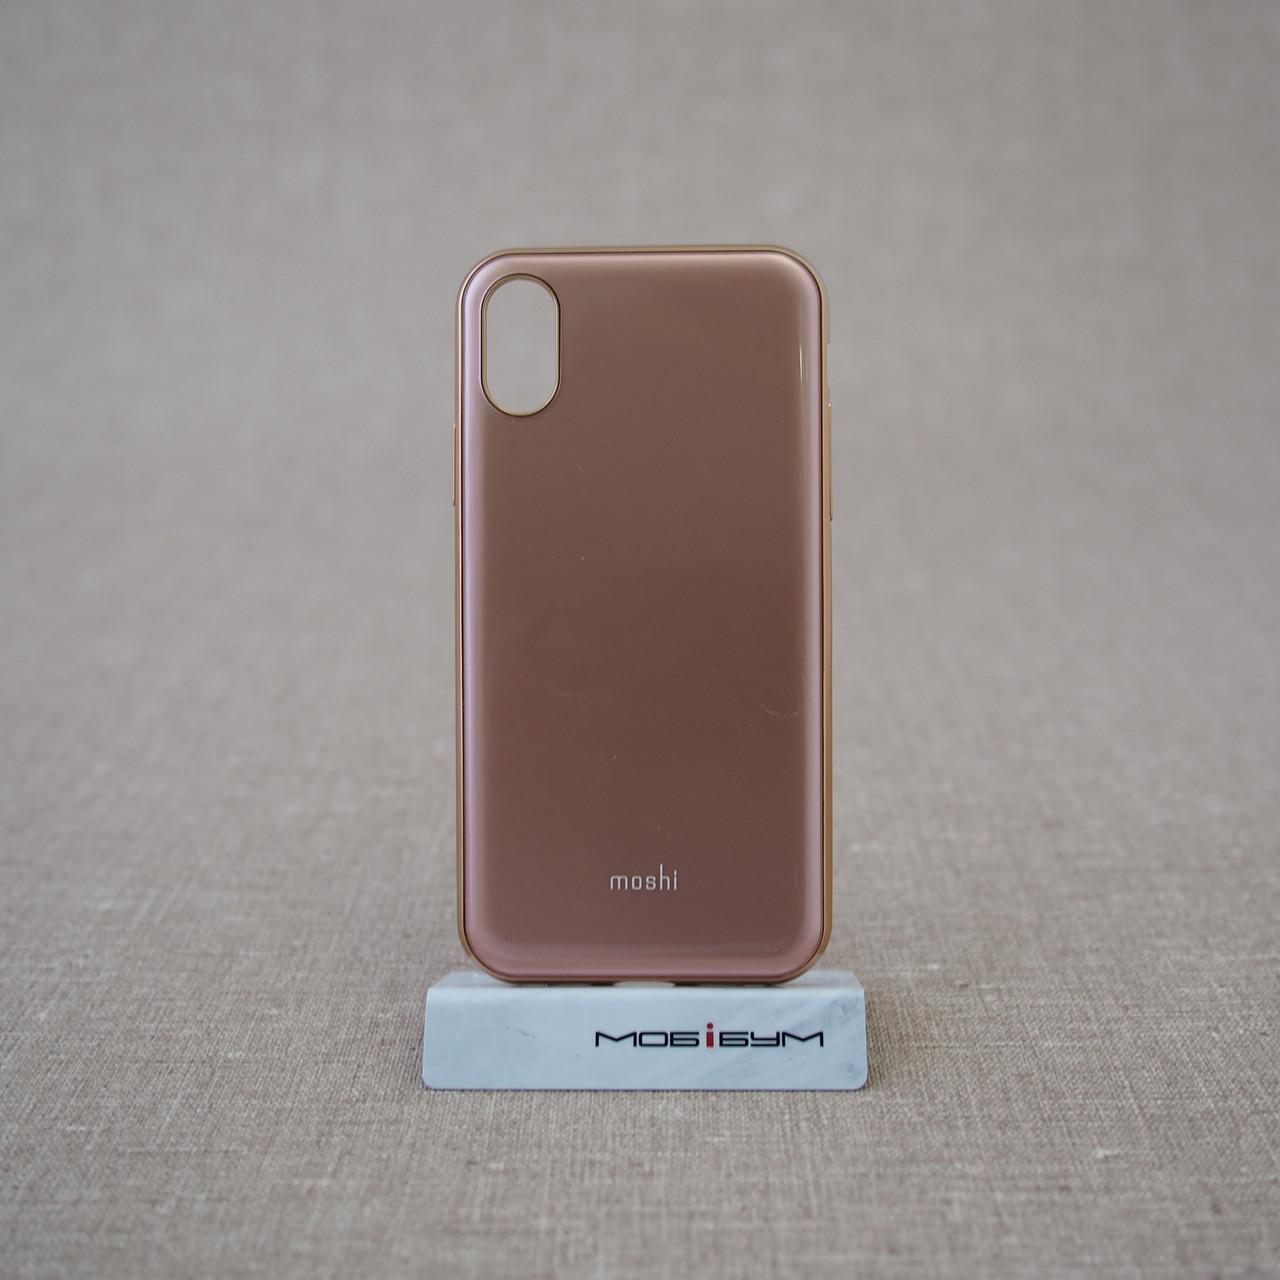 Чехол Moshi iGlaze Slim iPhone X taupe pink (99MO0101301) EAN/UPC: 4713057252549